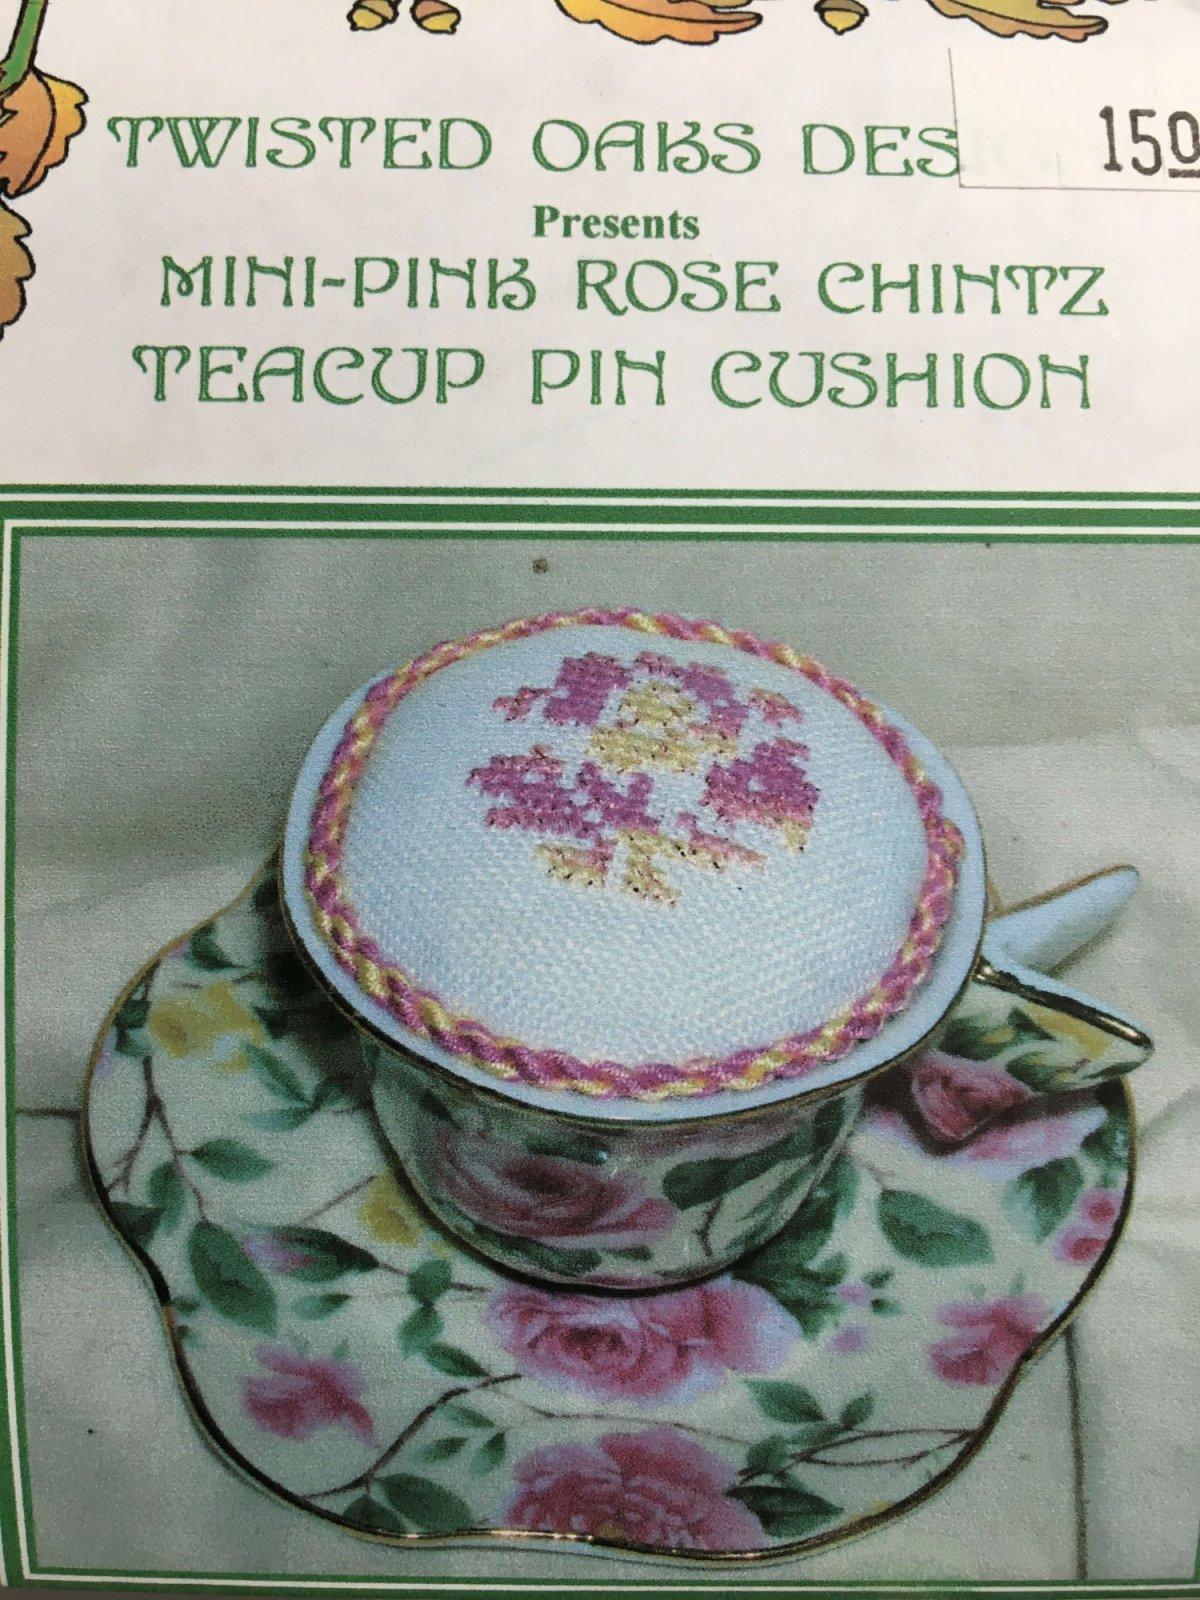 Twisted Oaks Designs Mini Pink Rose Chintz Teacup Pin Cushion kit